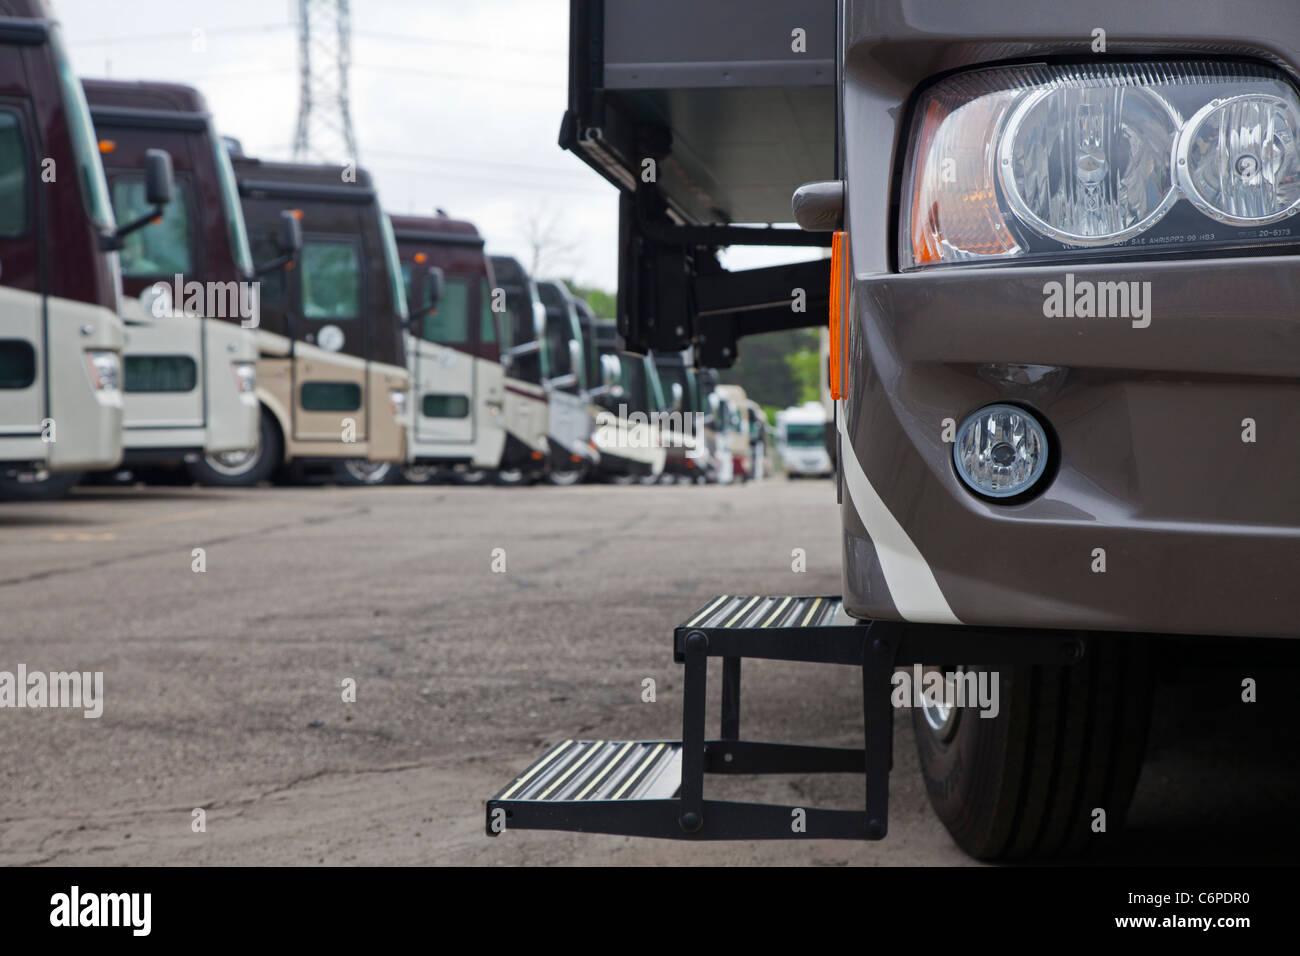 Luxury Vehicles Stock Photos & Luxury Vehicles Stock Images - Alamy